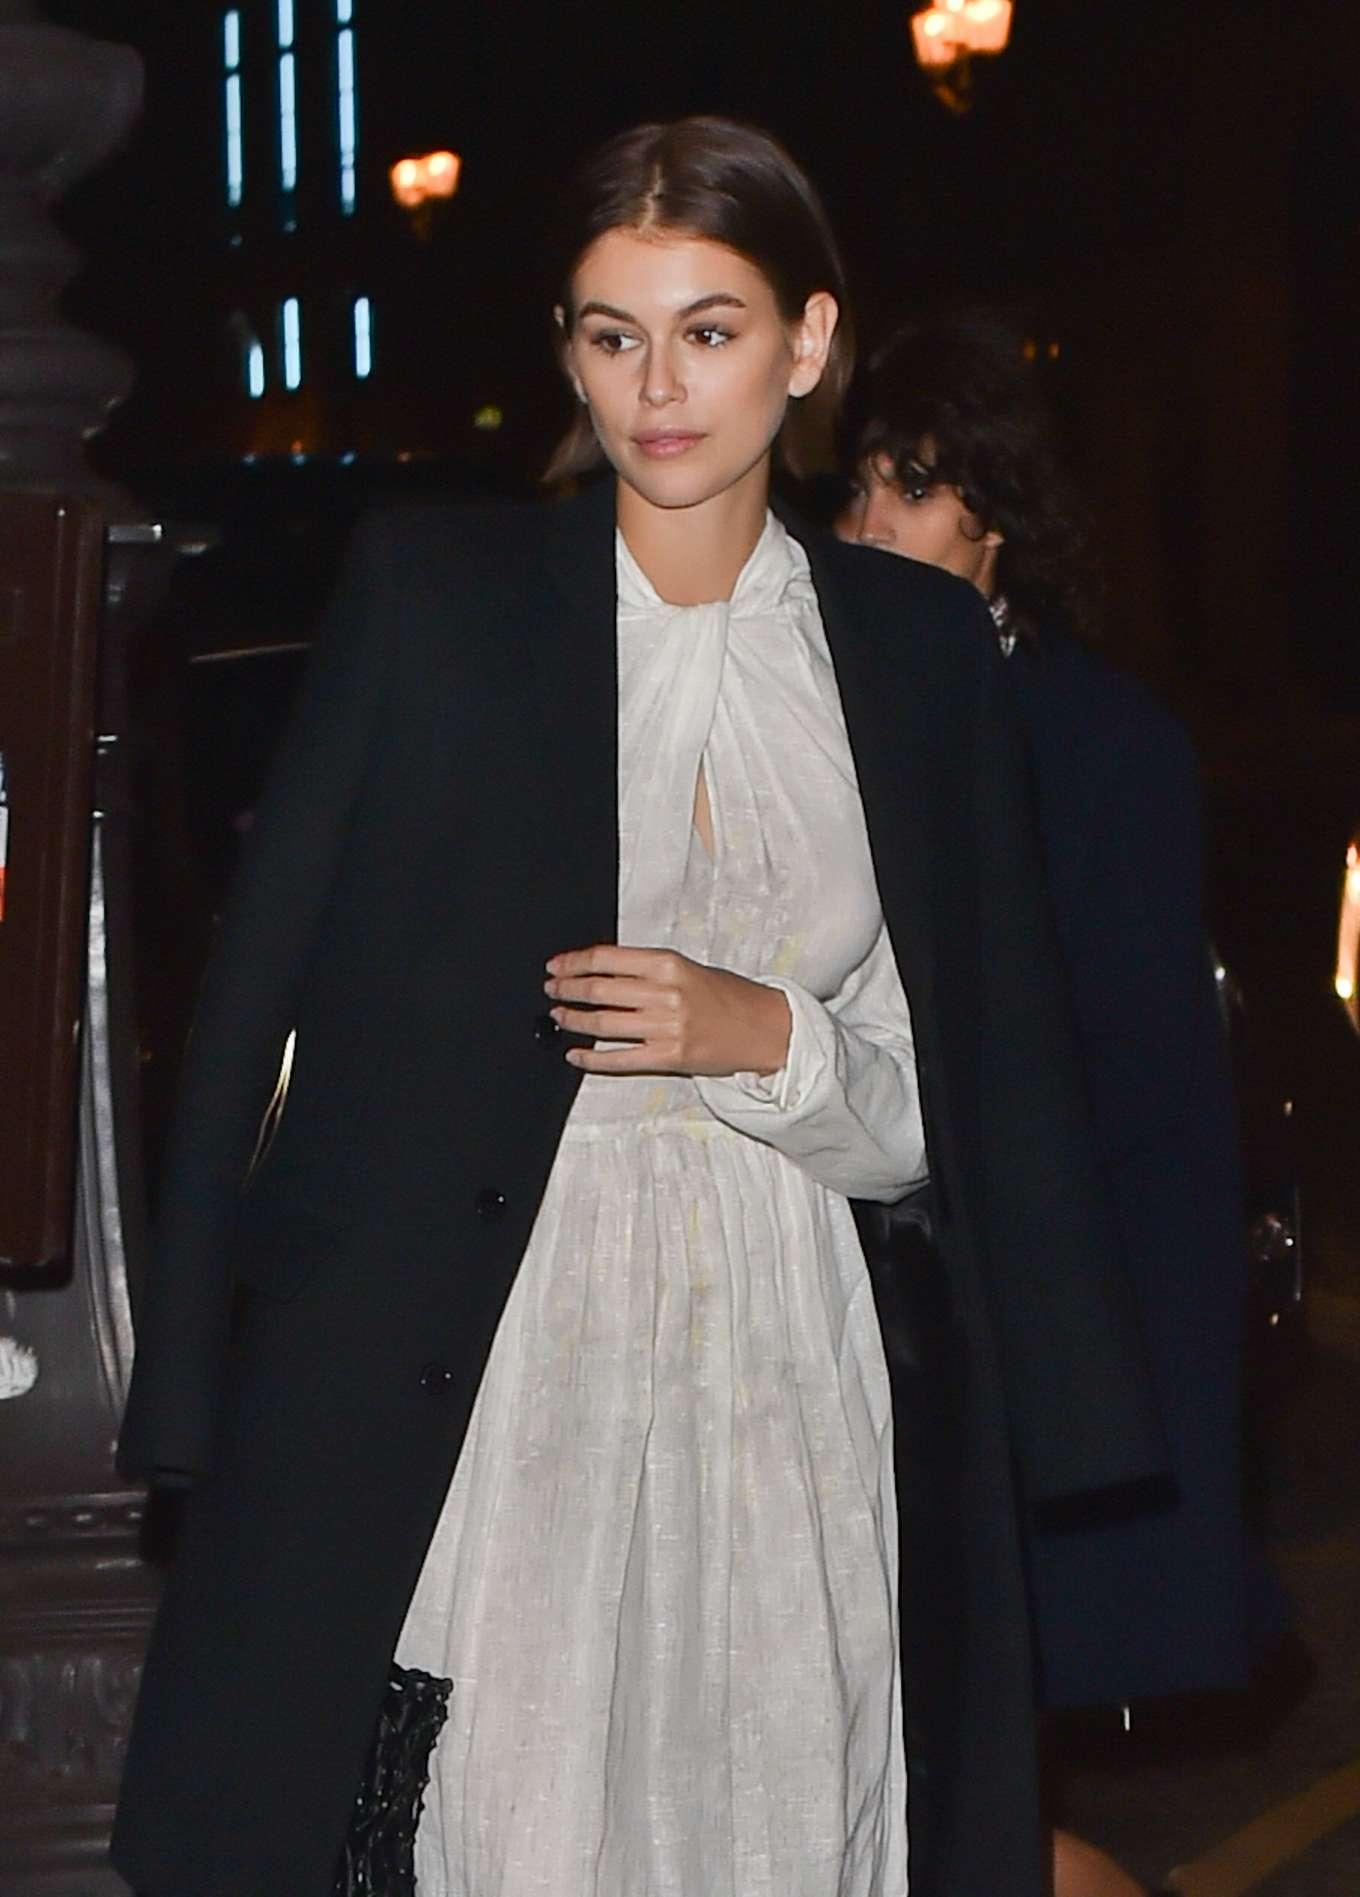 Kaia Gerber - Arrives at the Prada Dinner Party in Paris